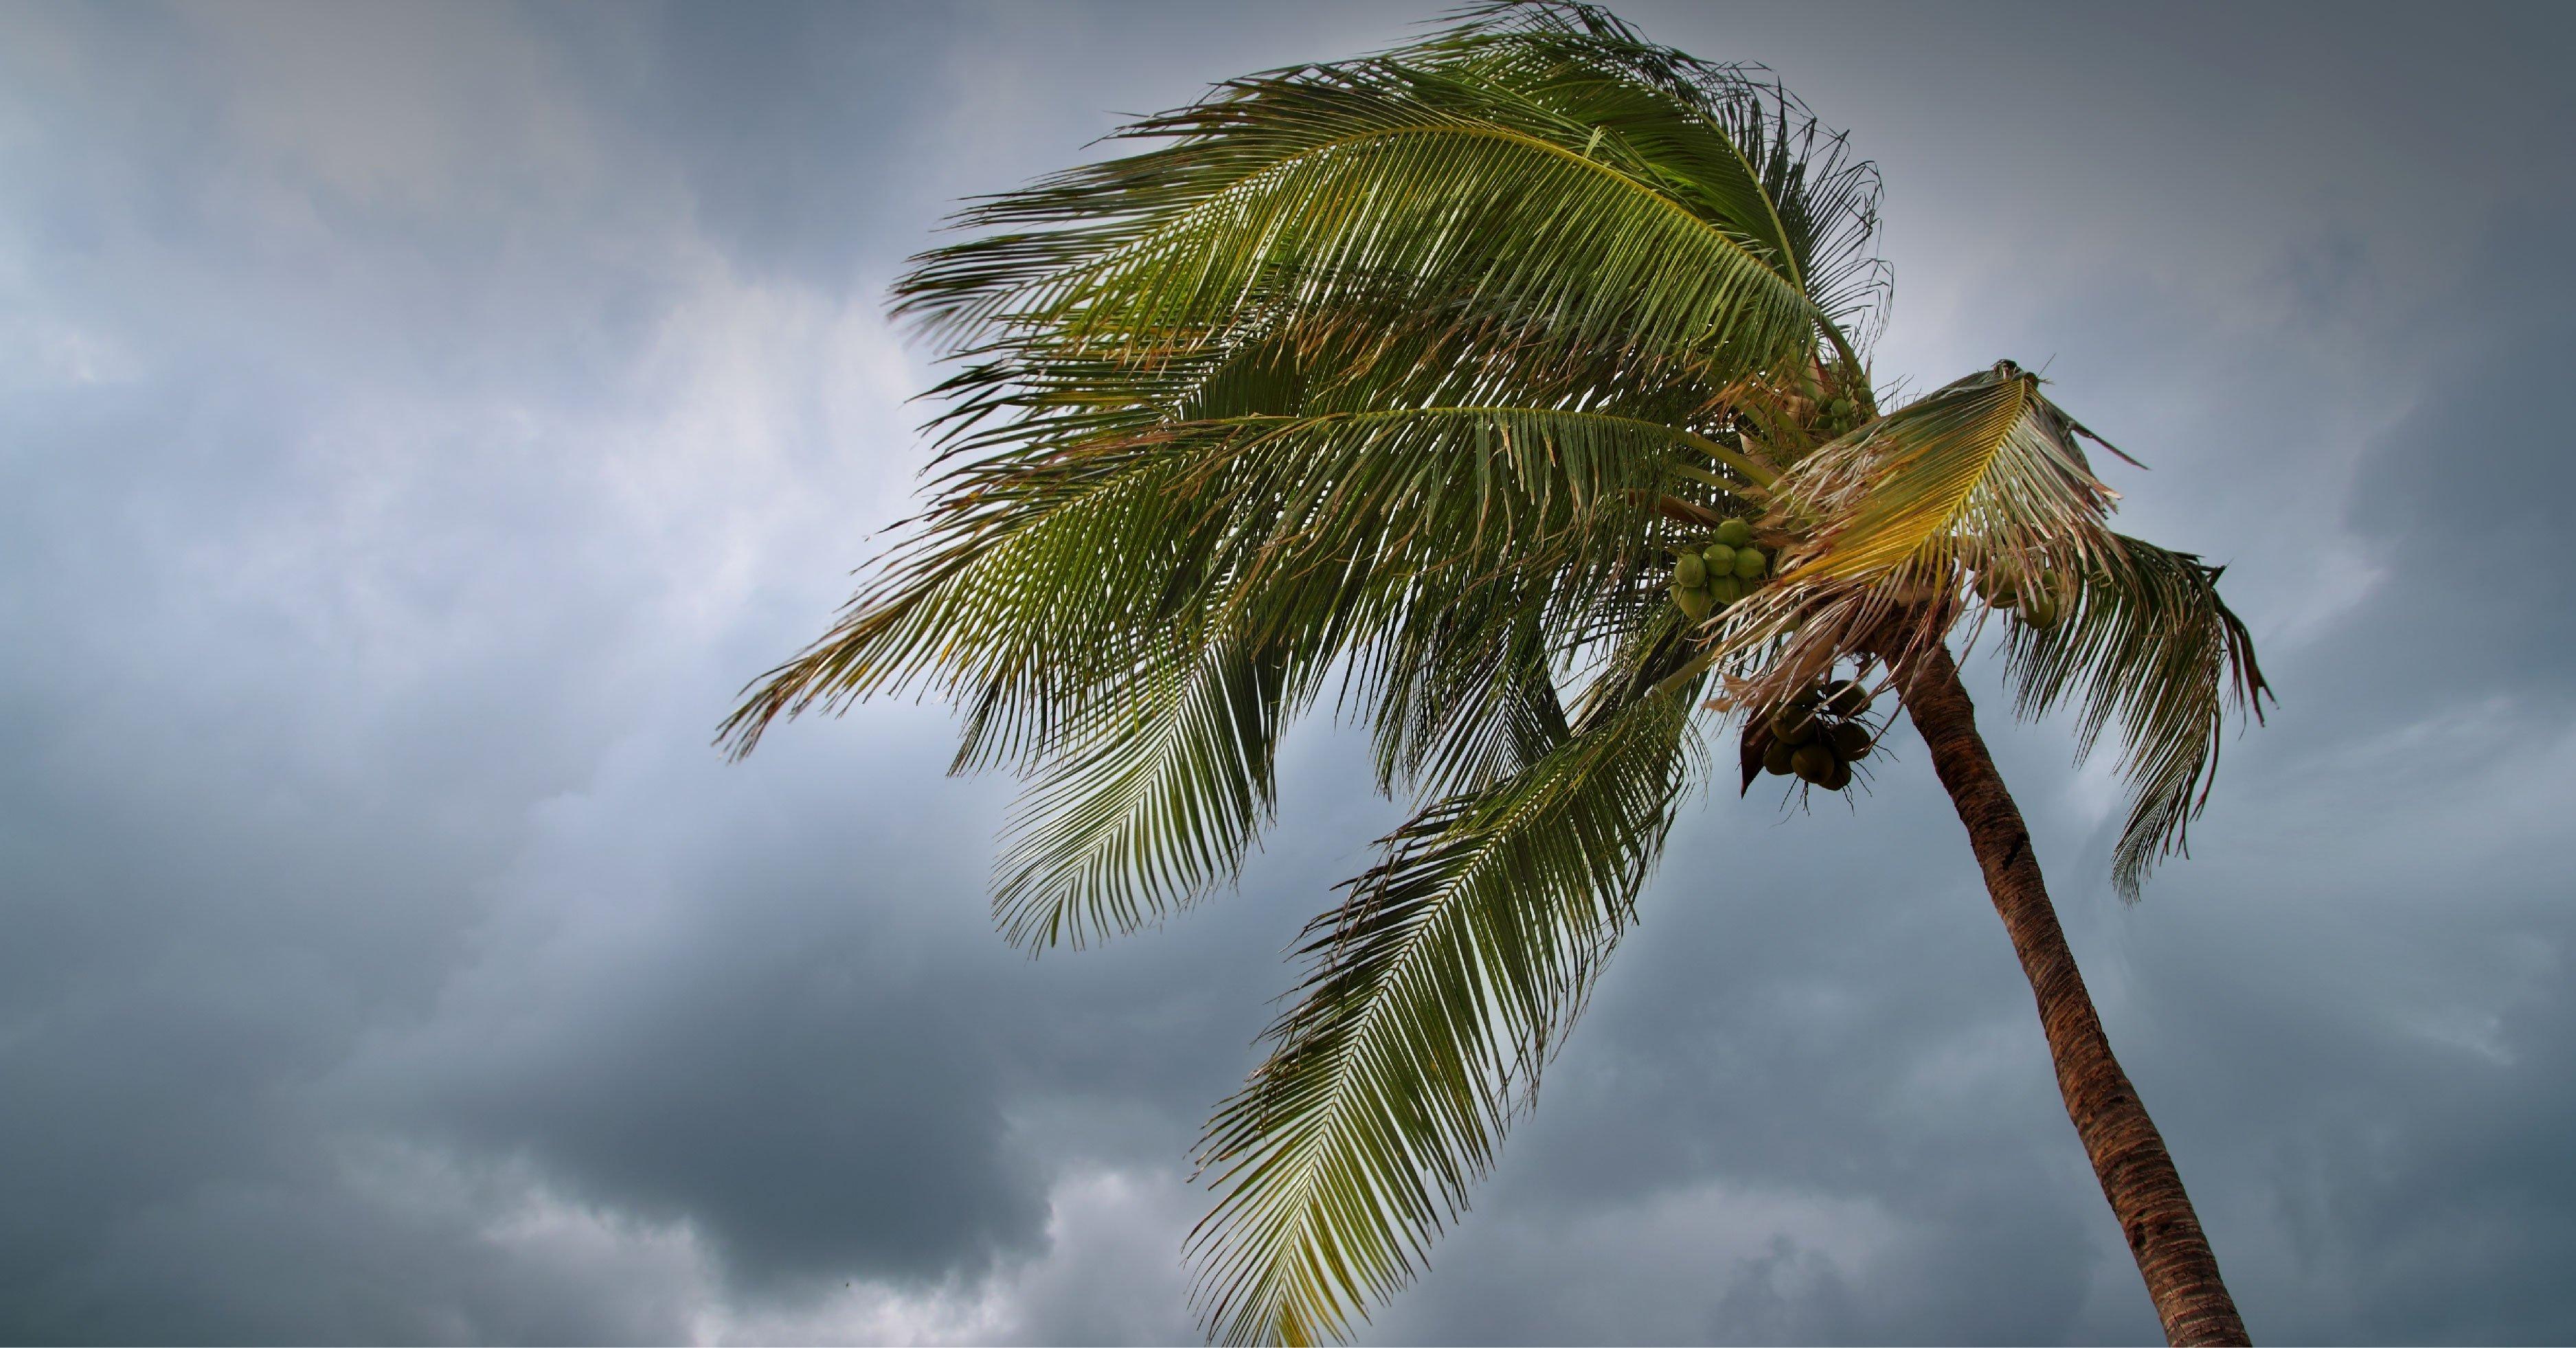 Temporada de huracanes 2021, lo que debes saber al respecto